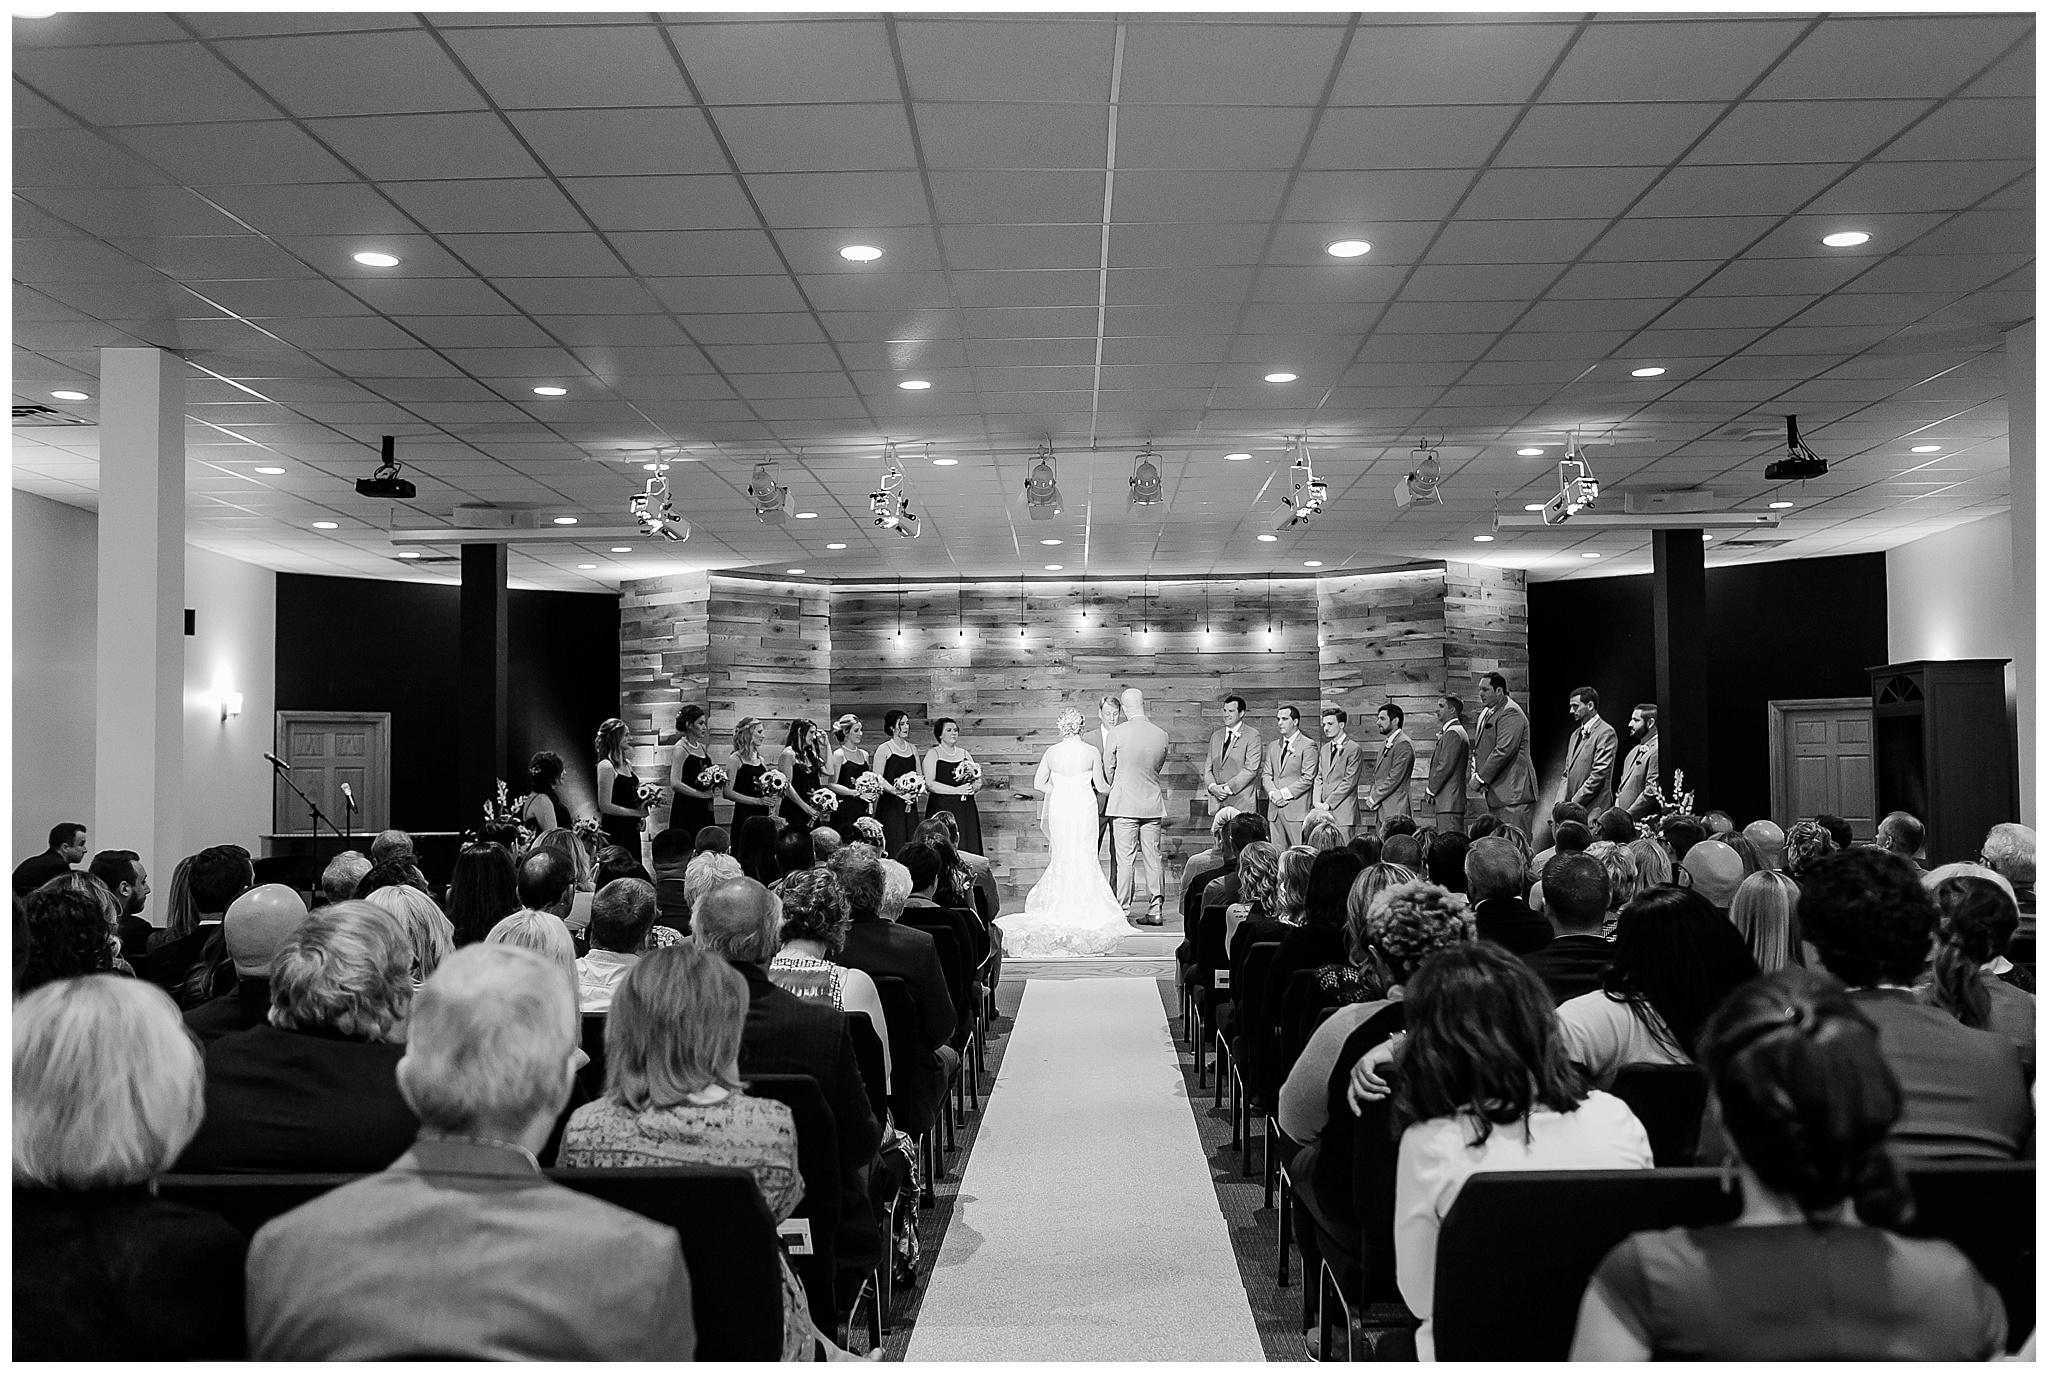 Venue_at_Milwaukee_Brewing_Company_wedding_milwaukee_wisconsin_0336.jpg